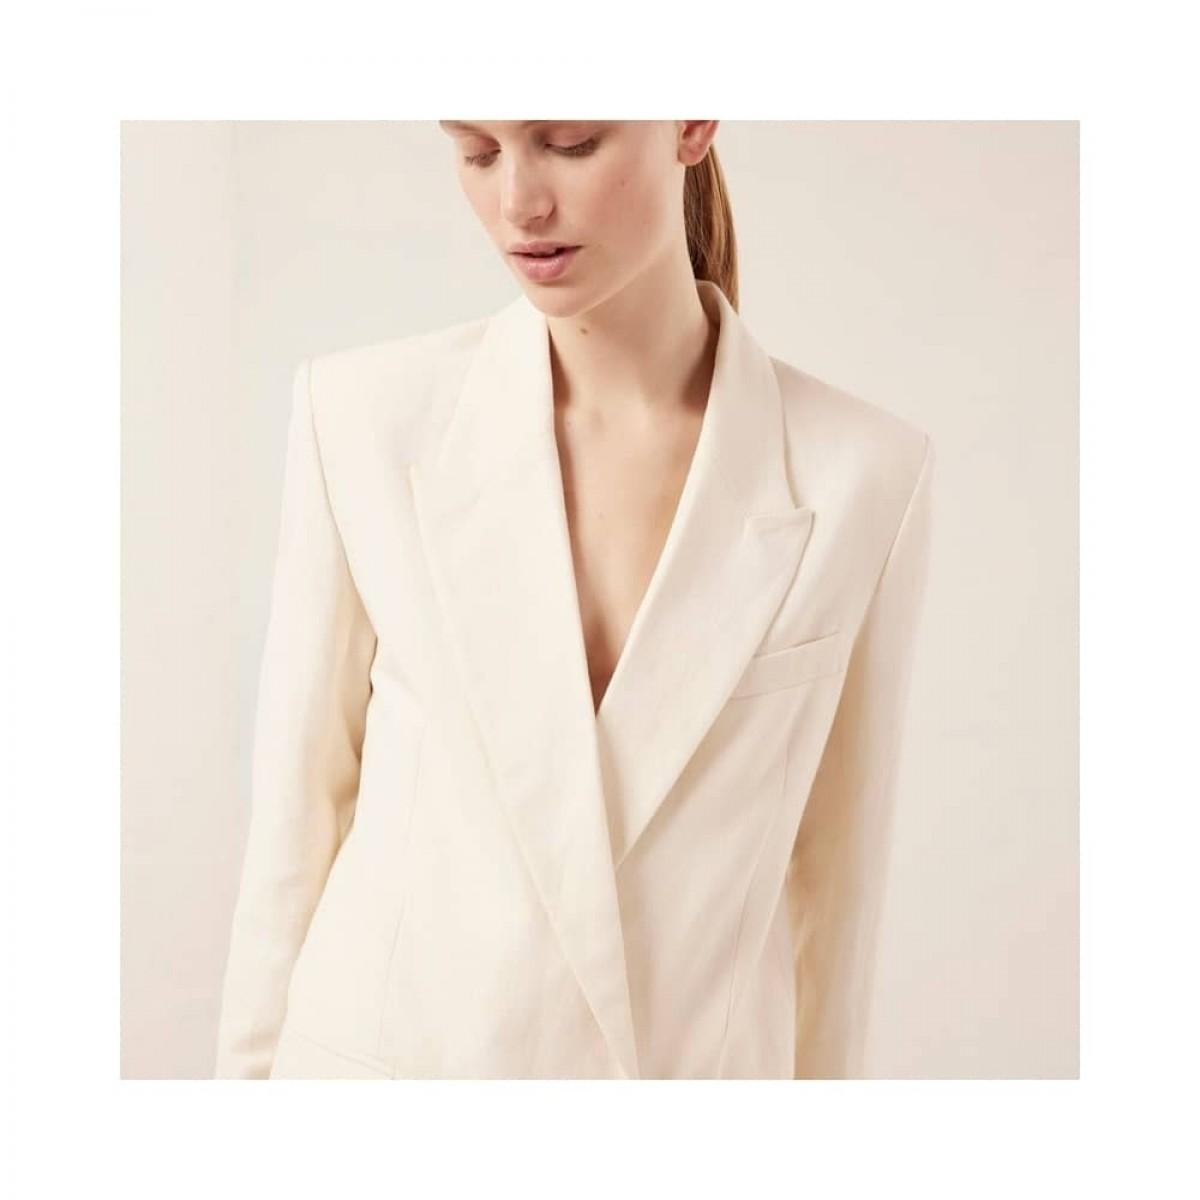 joe jacket - creme - model krave detalje